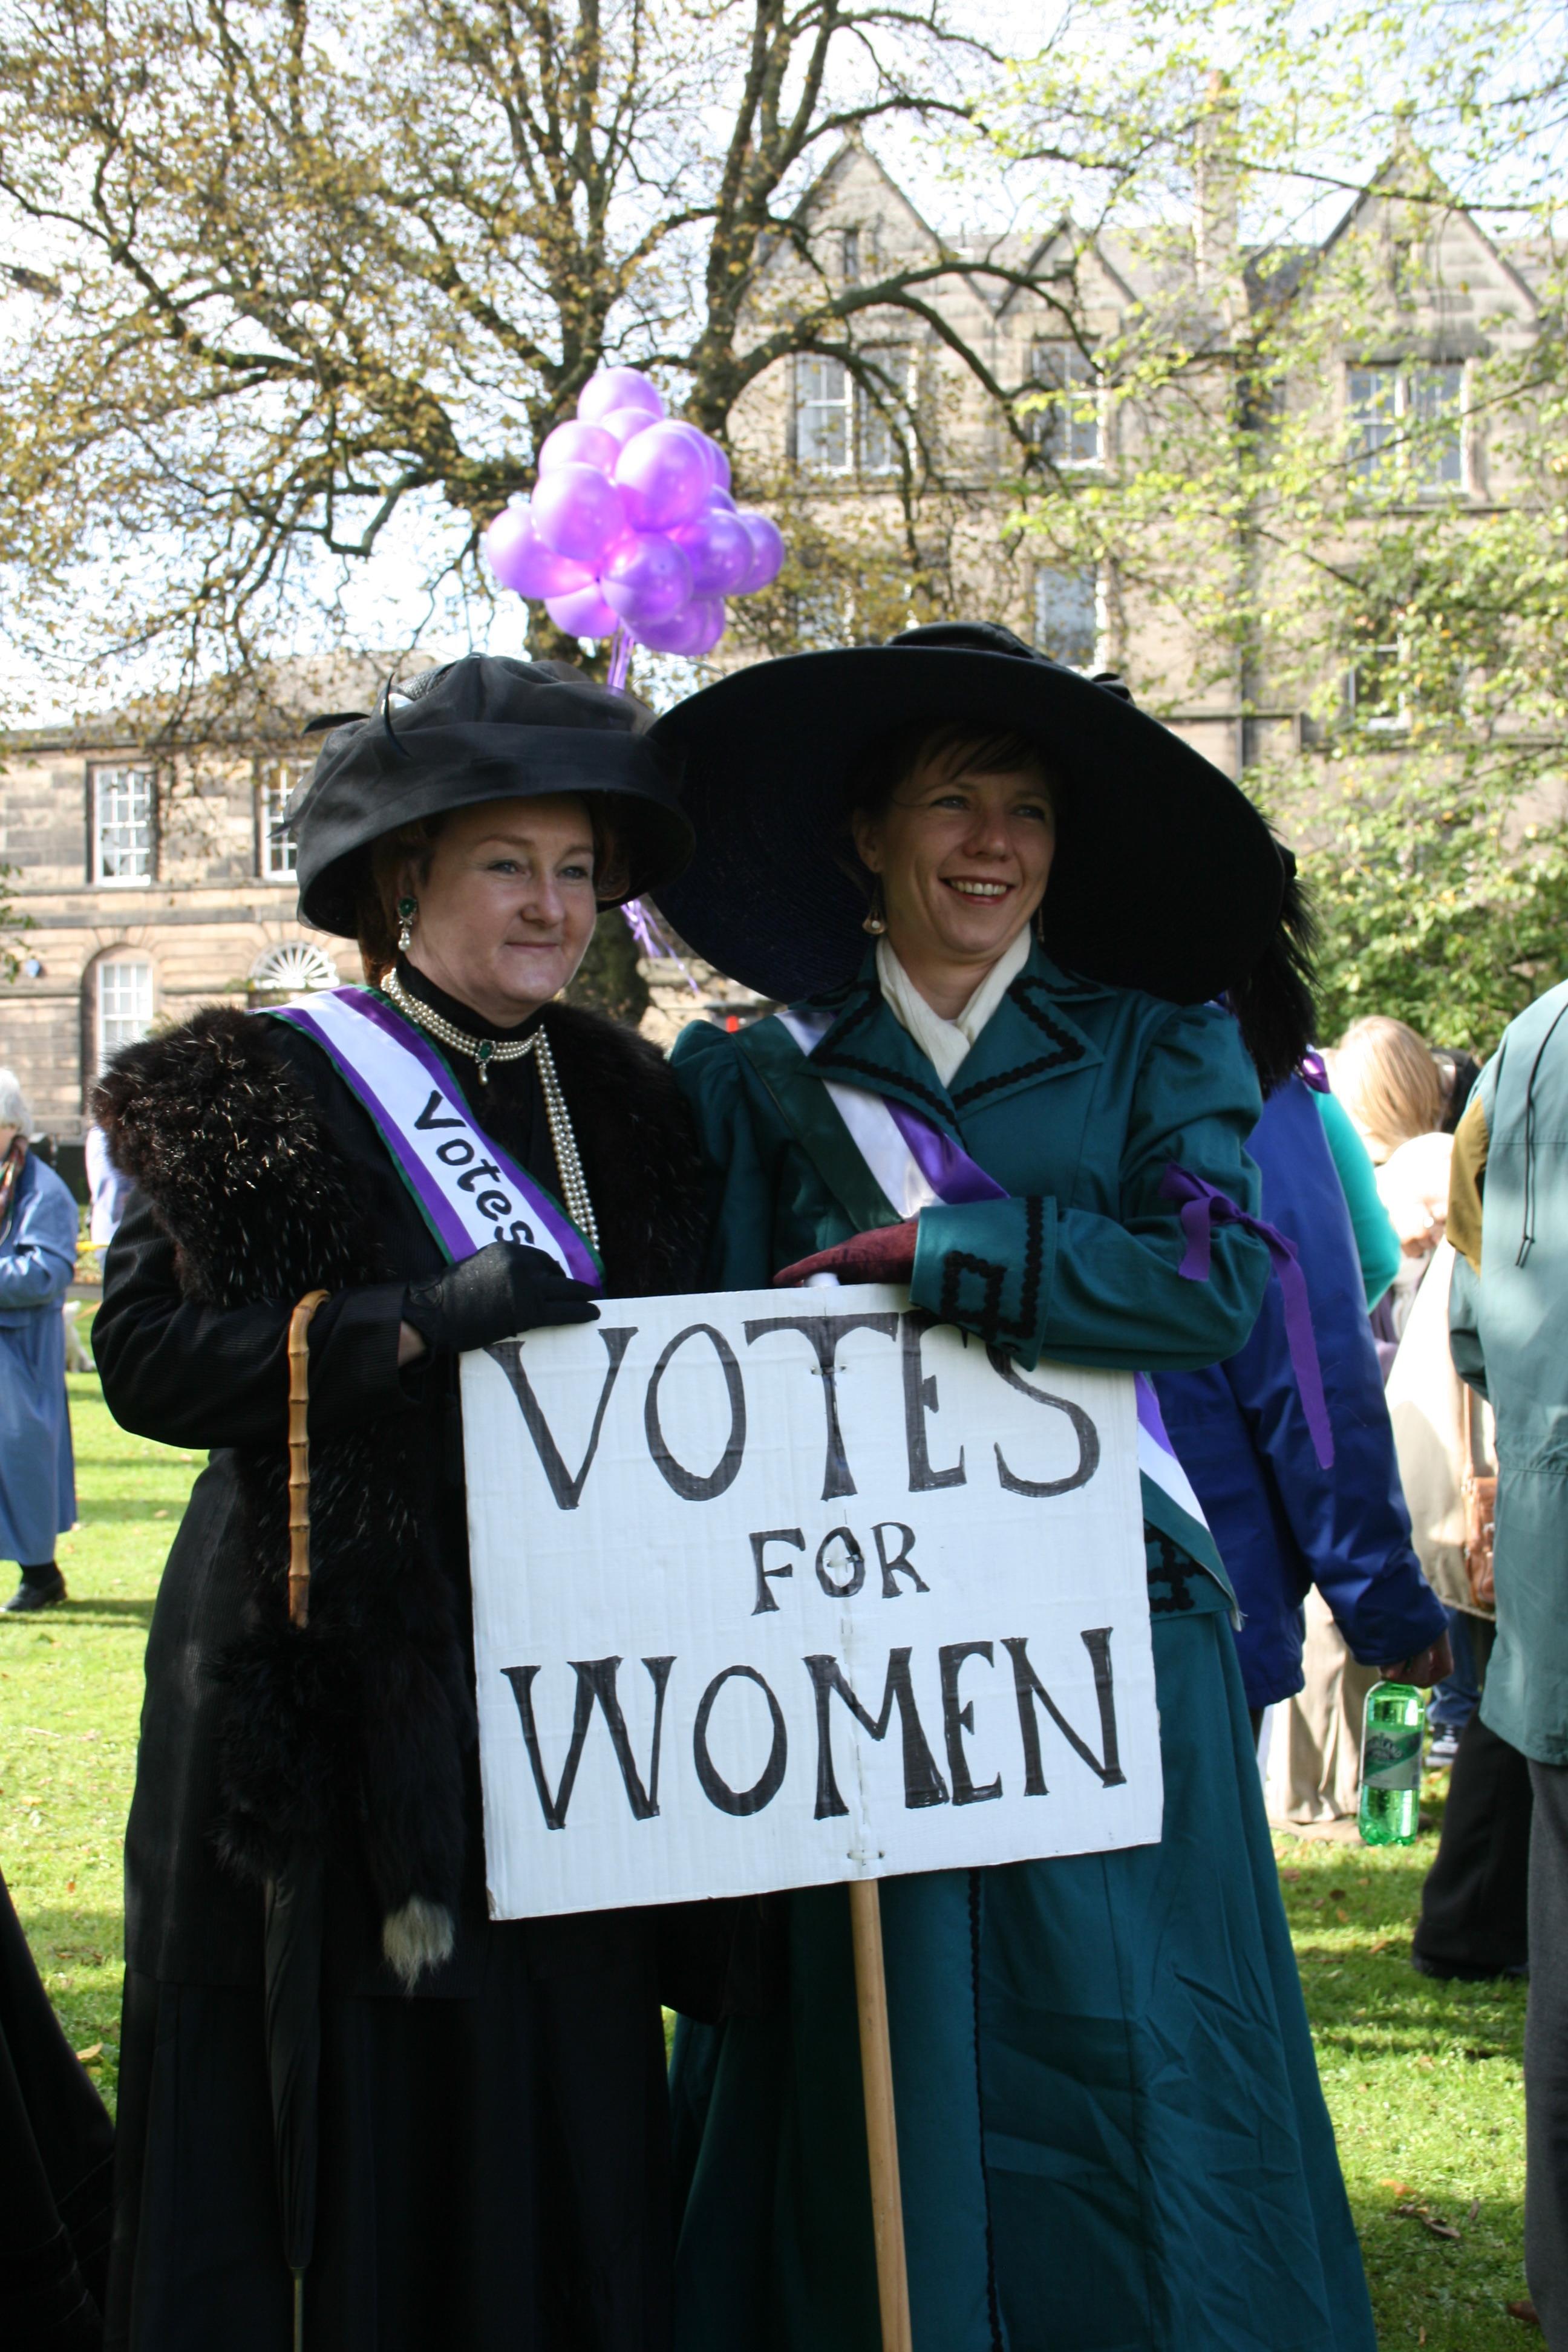 Costume Parade Dress-up Reenactment Suffragist Suffragette Sash